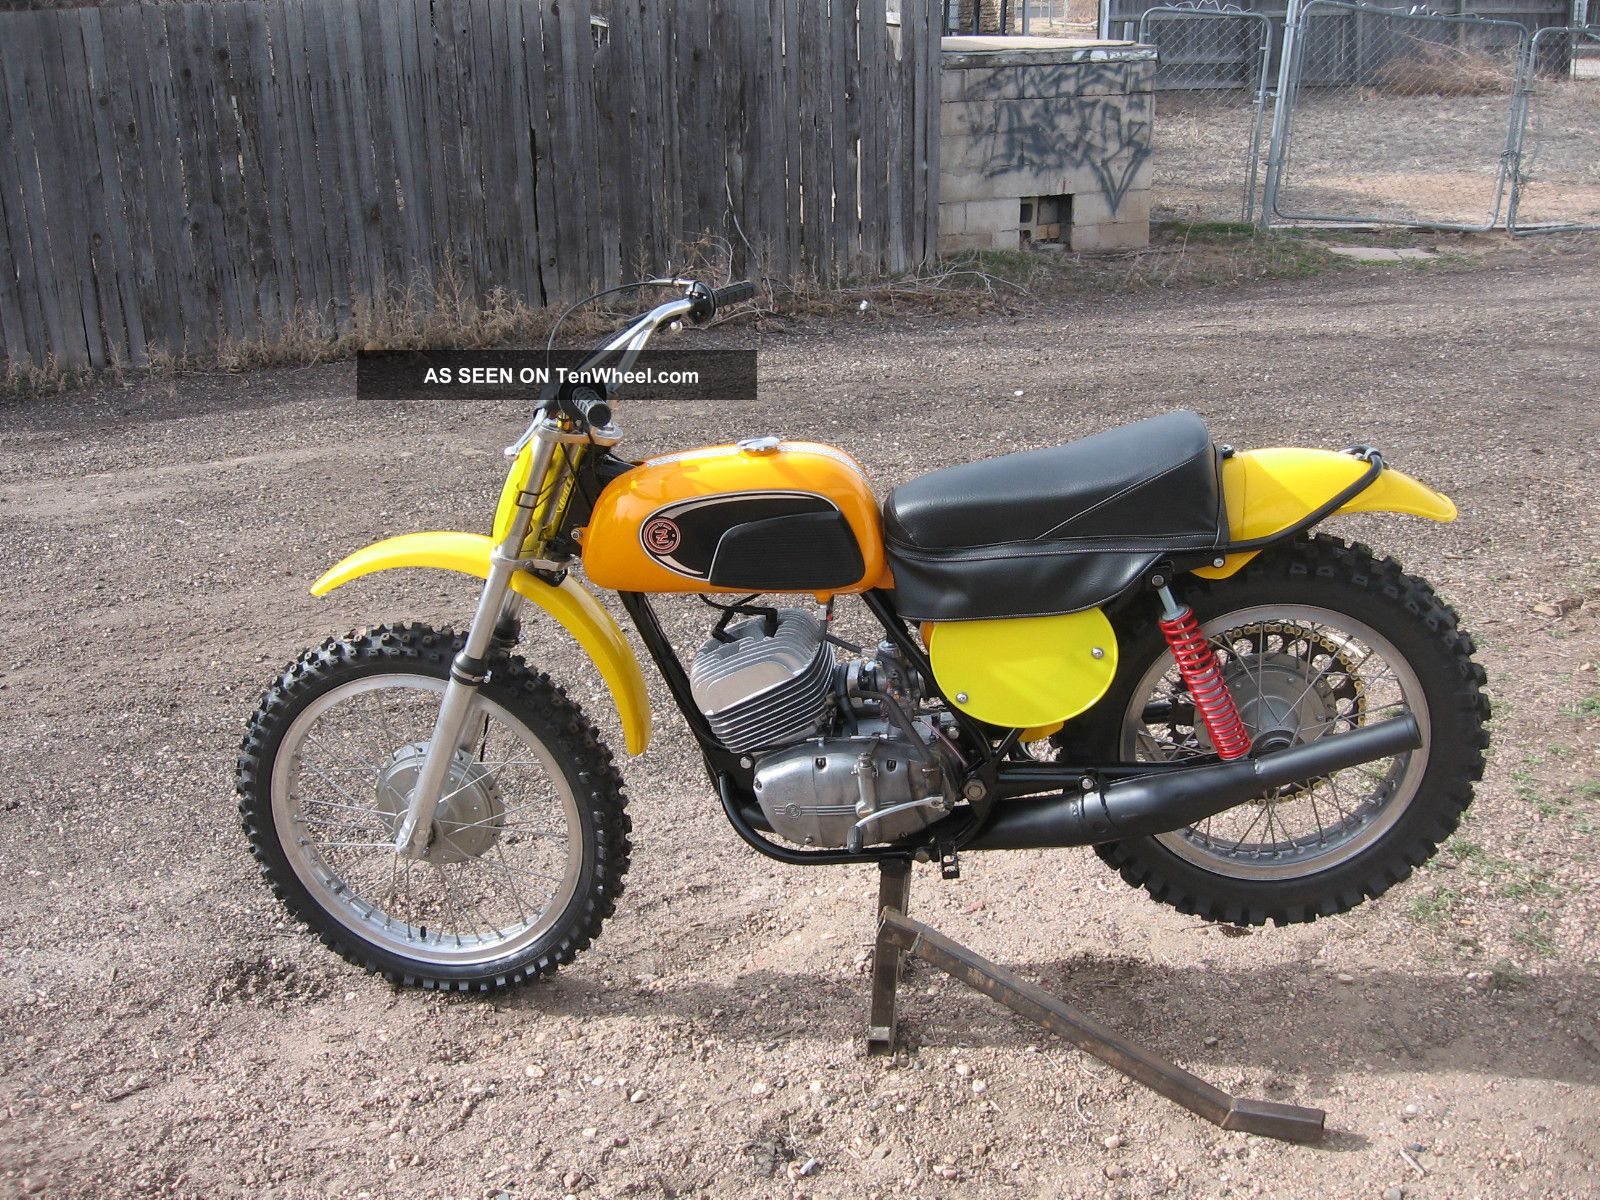 1971 Cz 250 Yellow Tank Mx Dirt Bike Other Makes photo